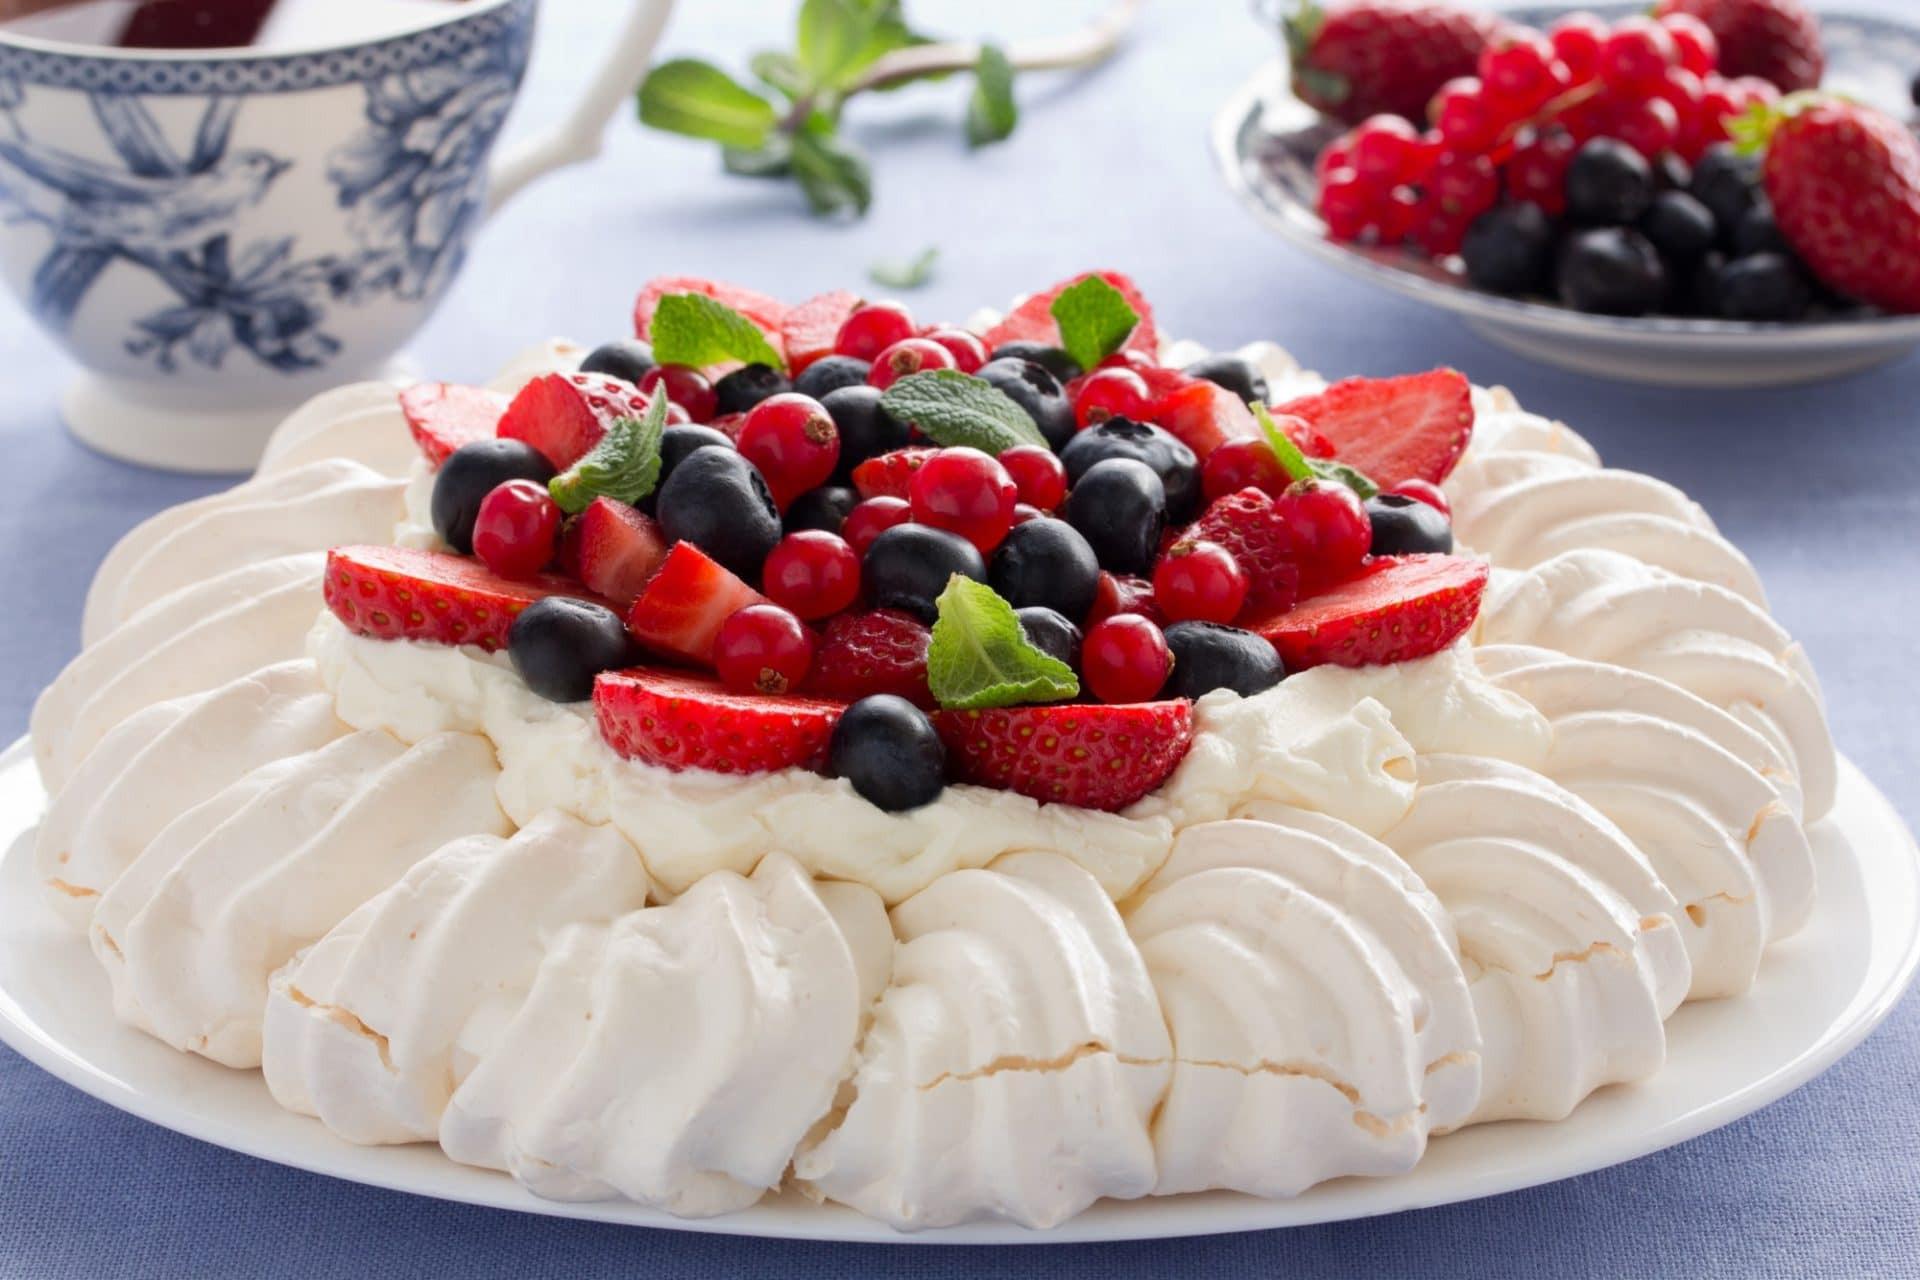 Pavlova Dessert Recipe  A Delicious Introduction To Iconic Australian Desserts